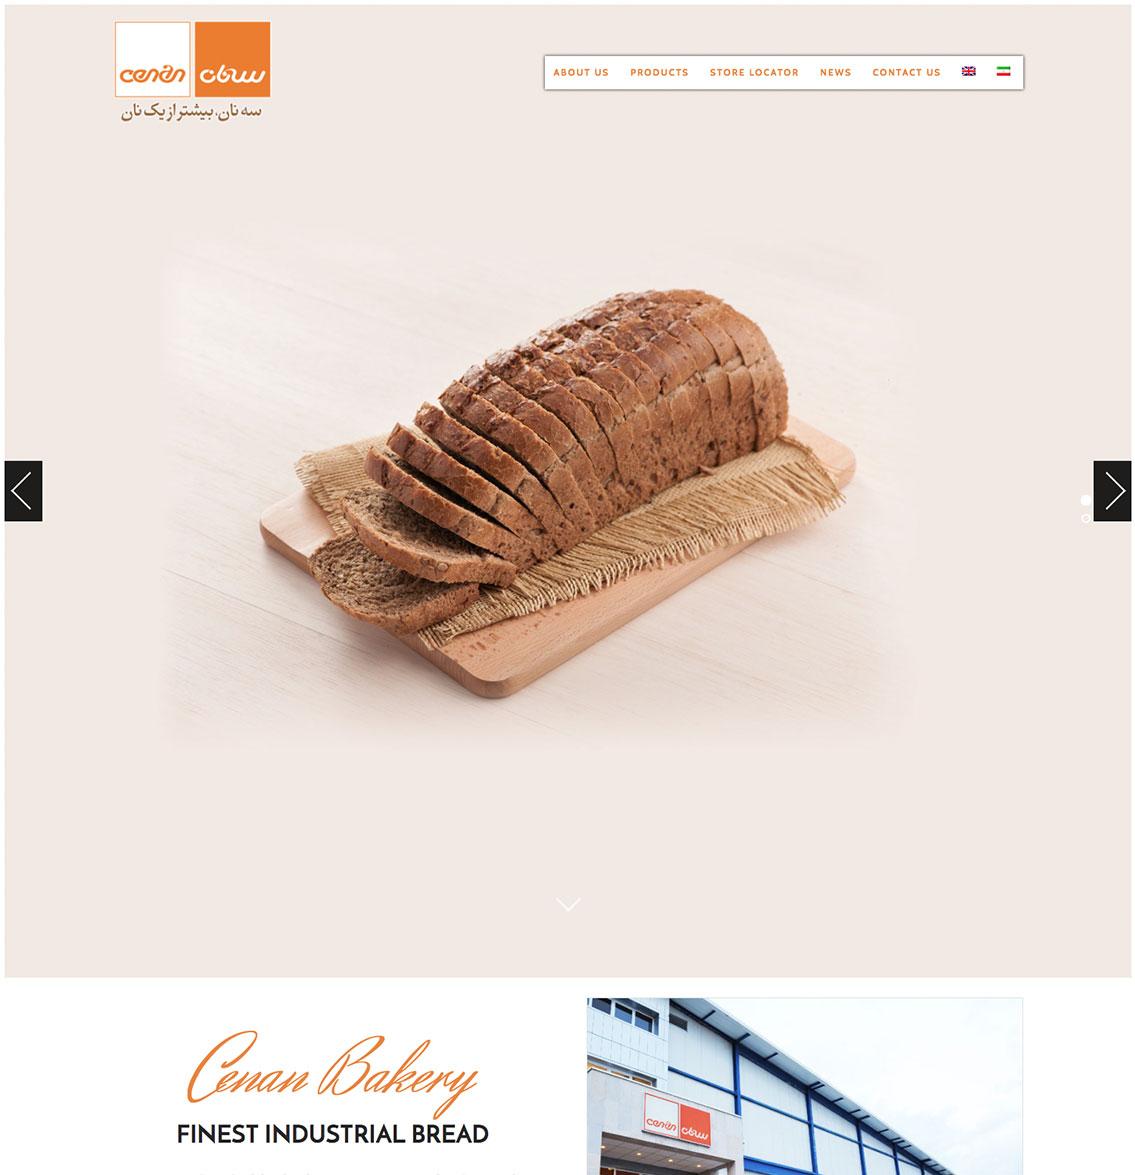 Cenan Bakery Factory